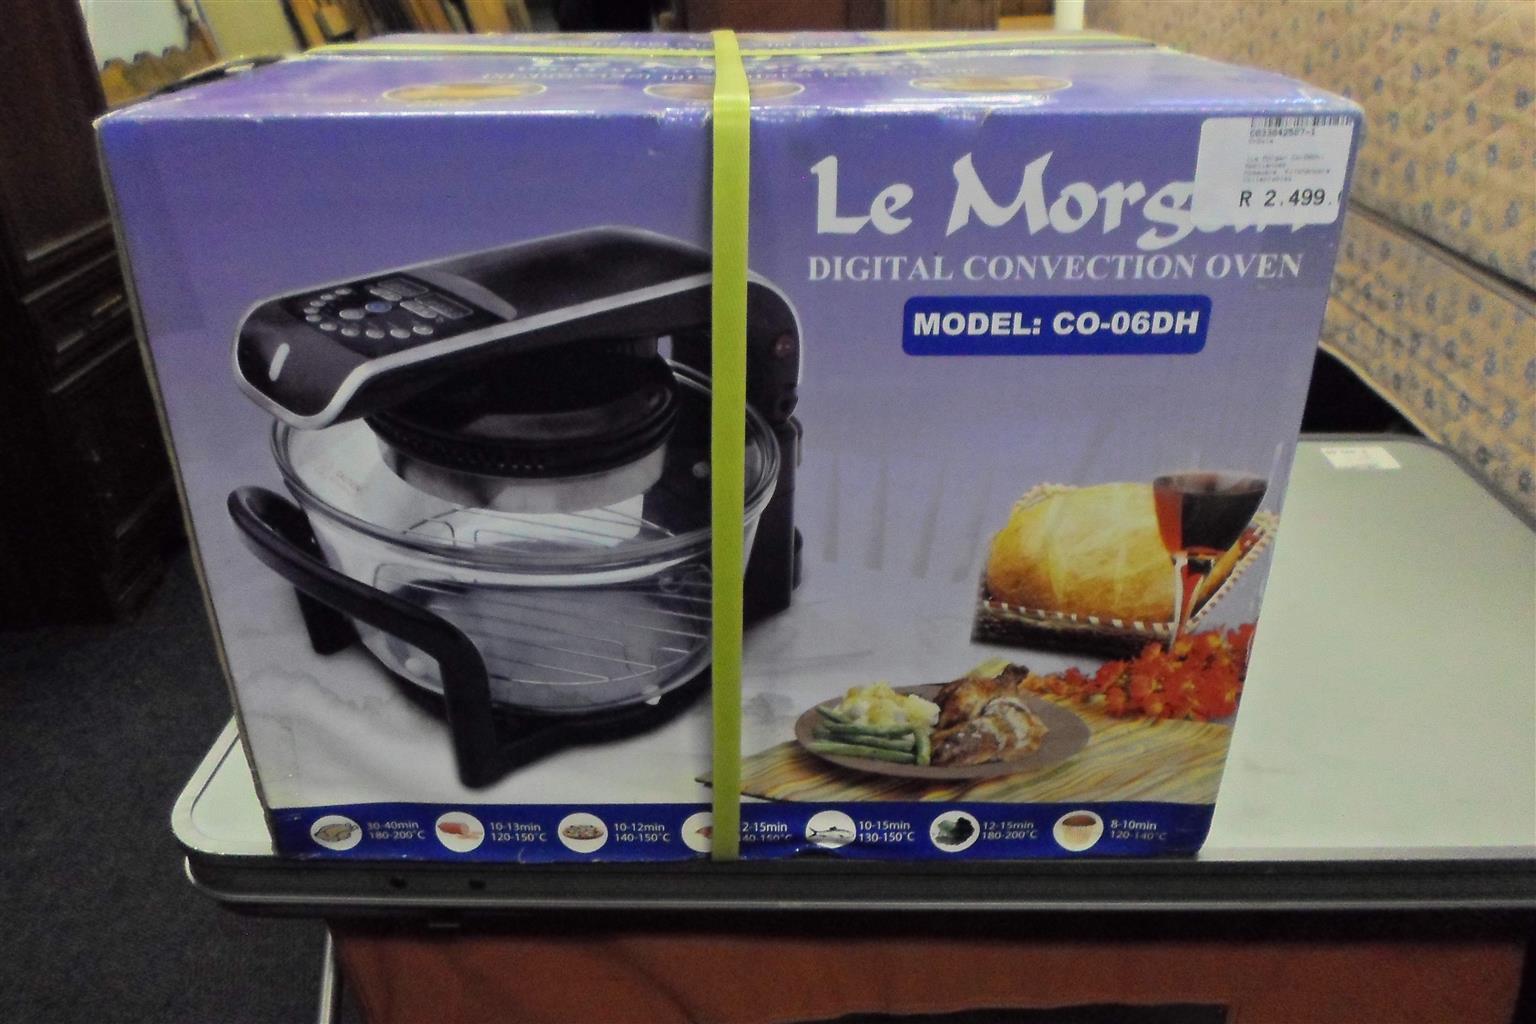 Le Morgan CO-06DH Digital Conviction Oven - C033042507-1